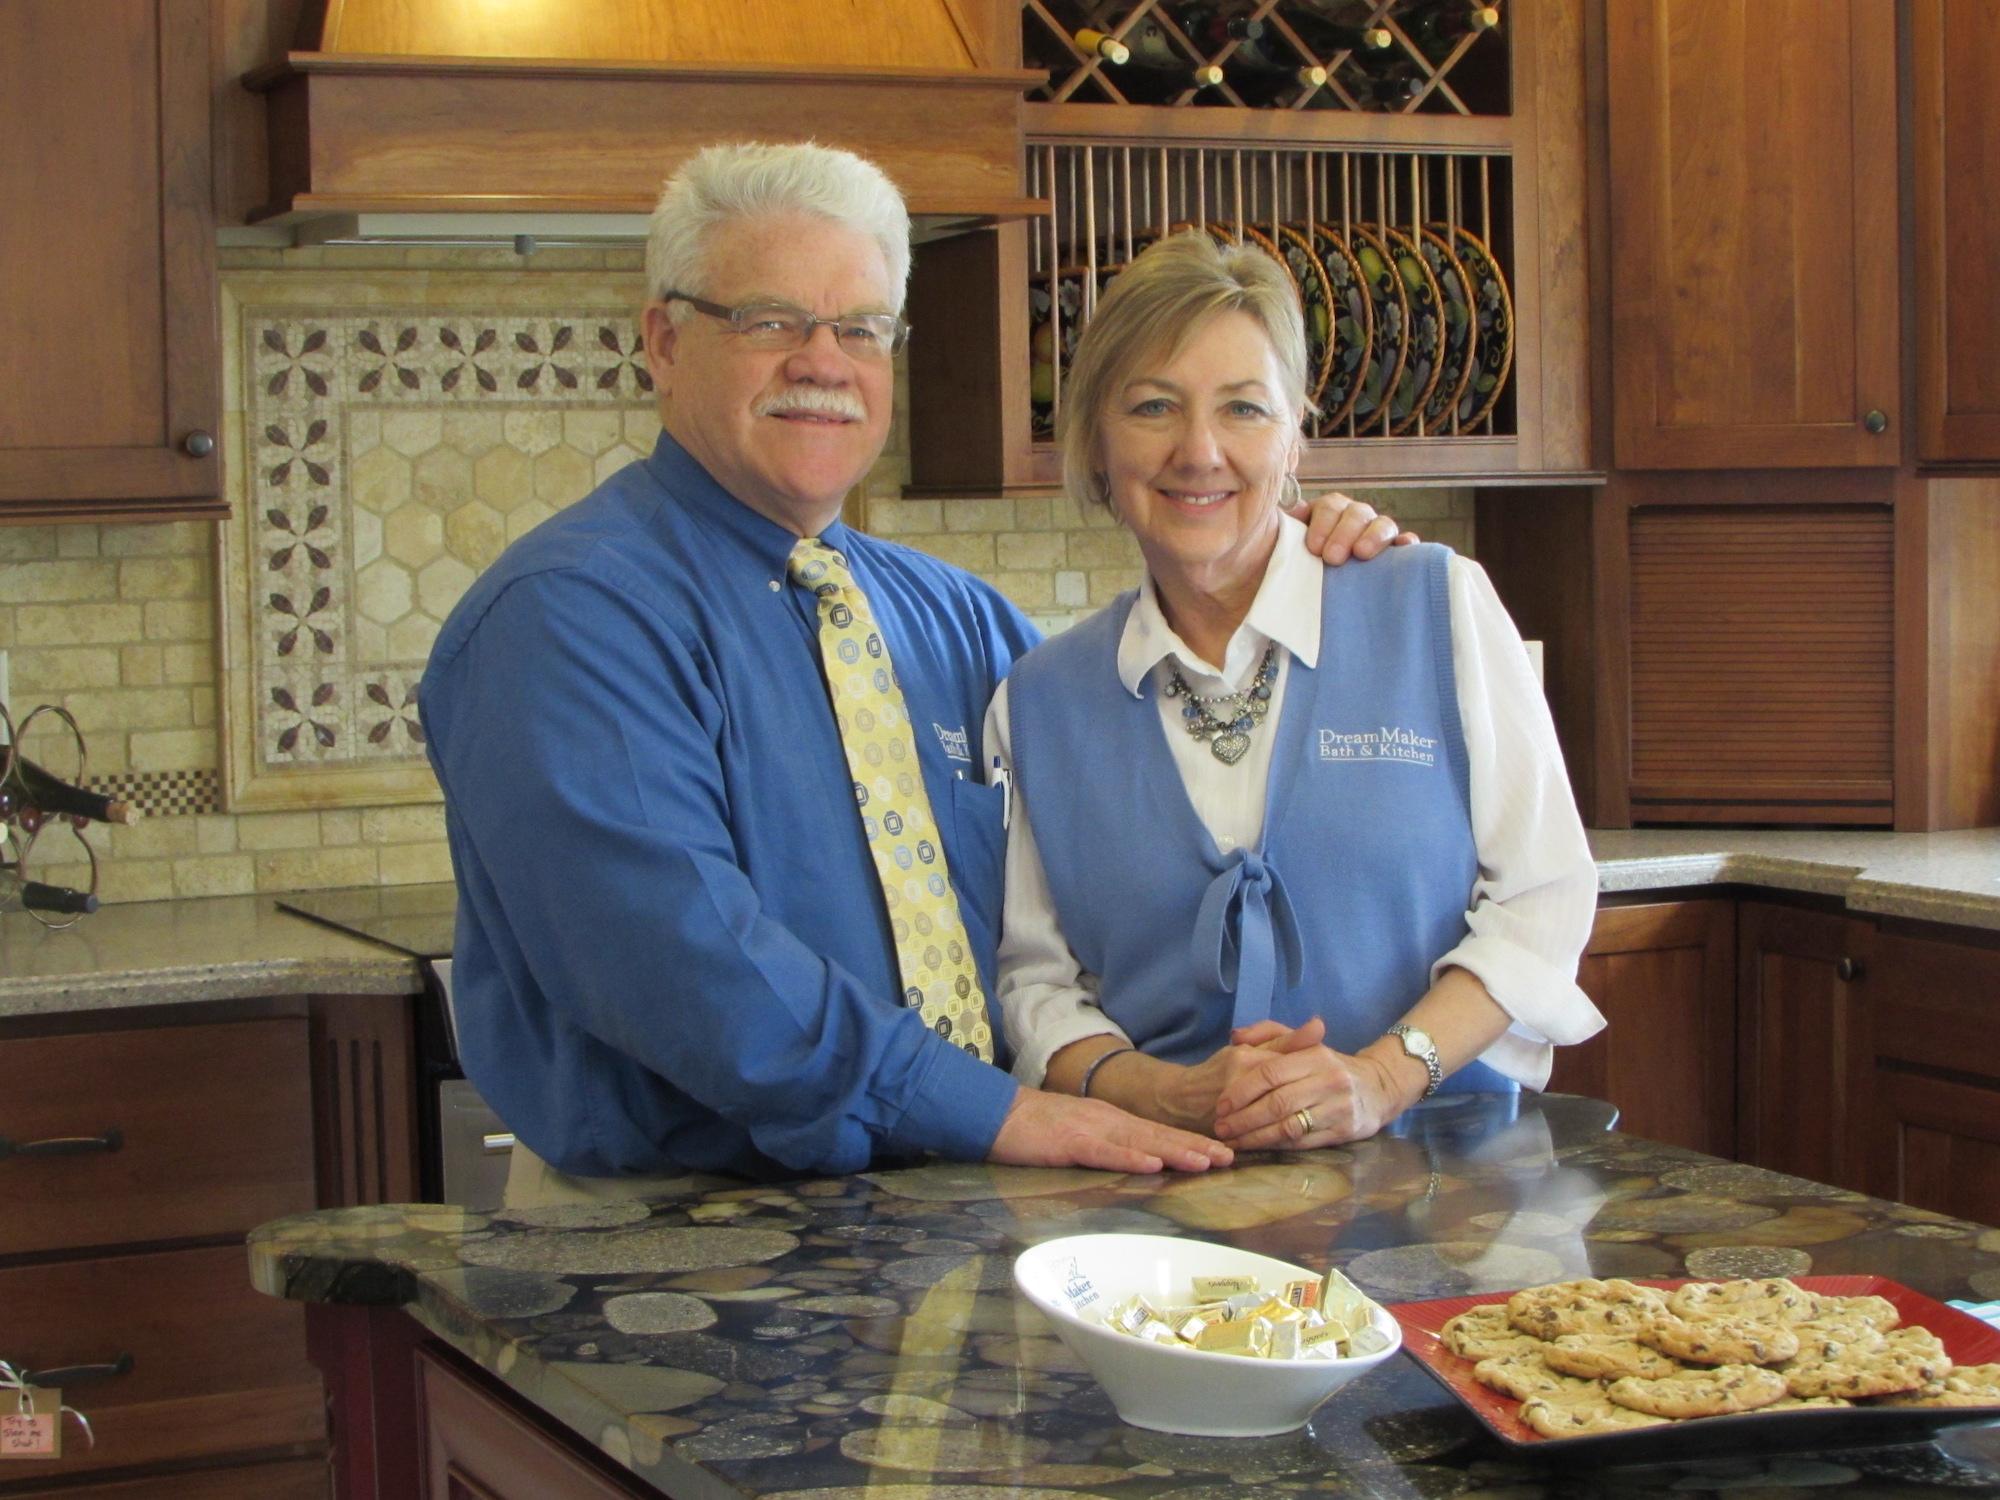 Remodeling Big 50 2015: DreamMaker Bath & Kitchen of Greater ...